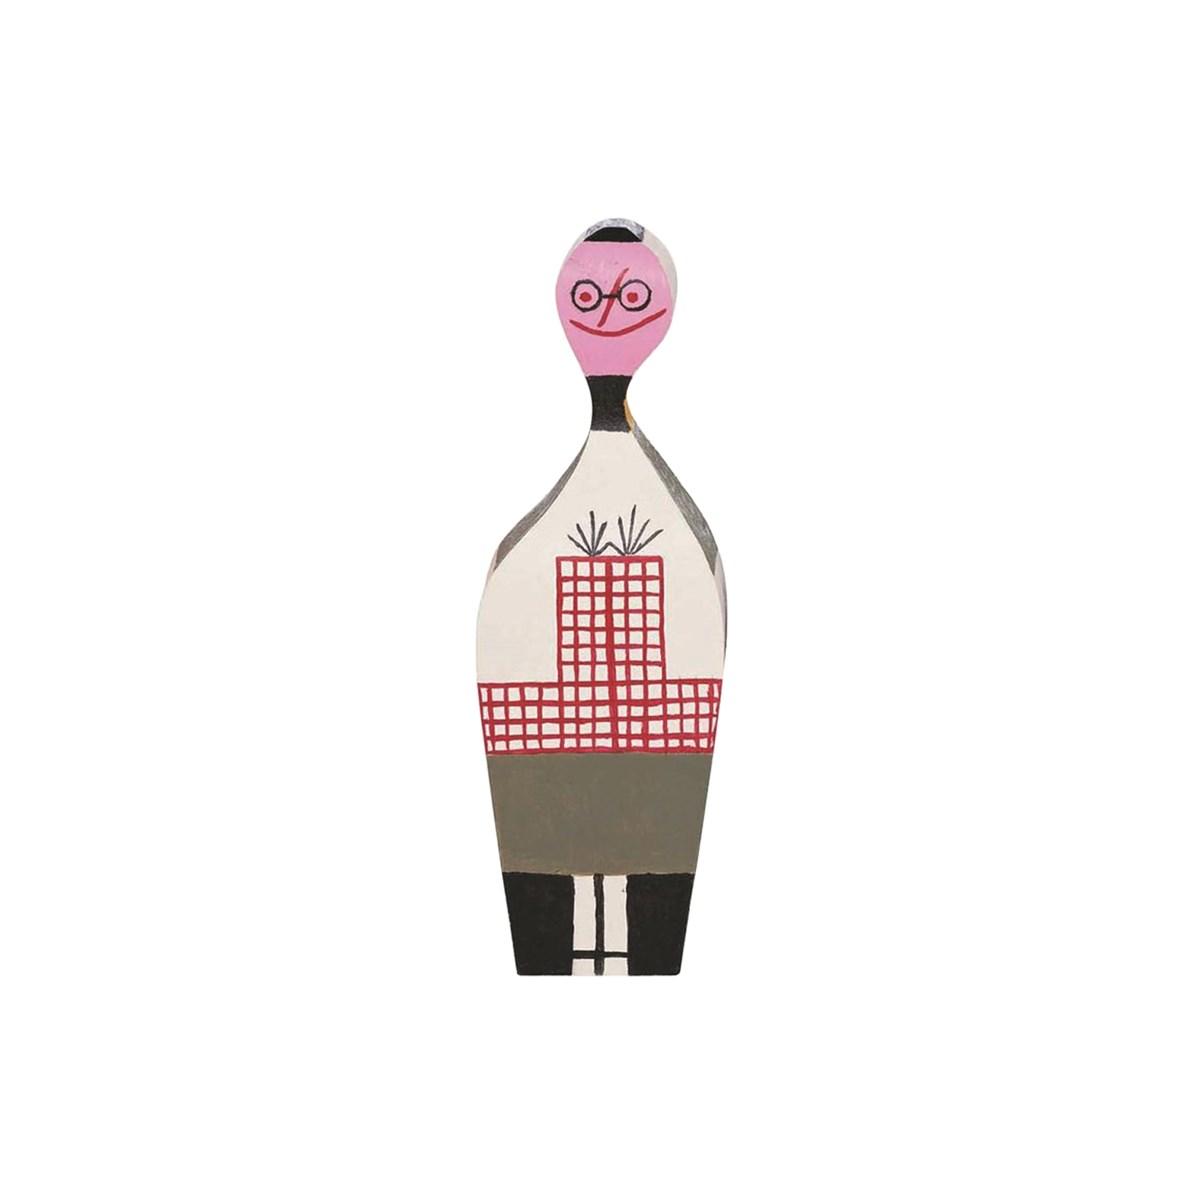 Vitra-Alexander-Girard-Wooden-Doll-No.8-Matisse-1